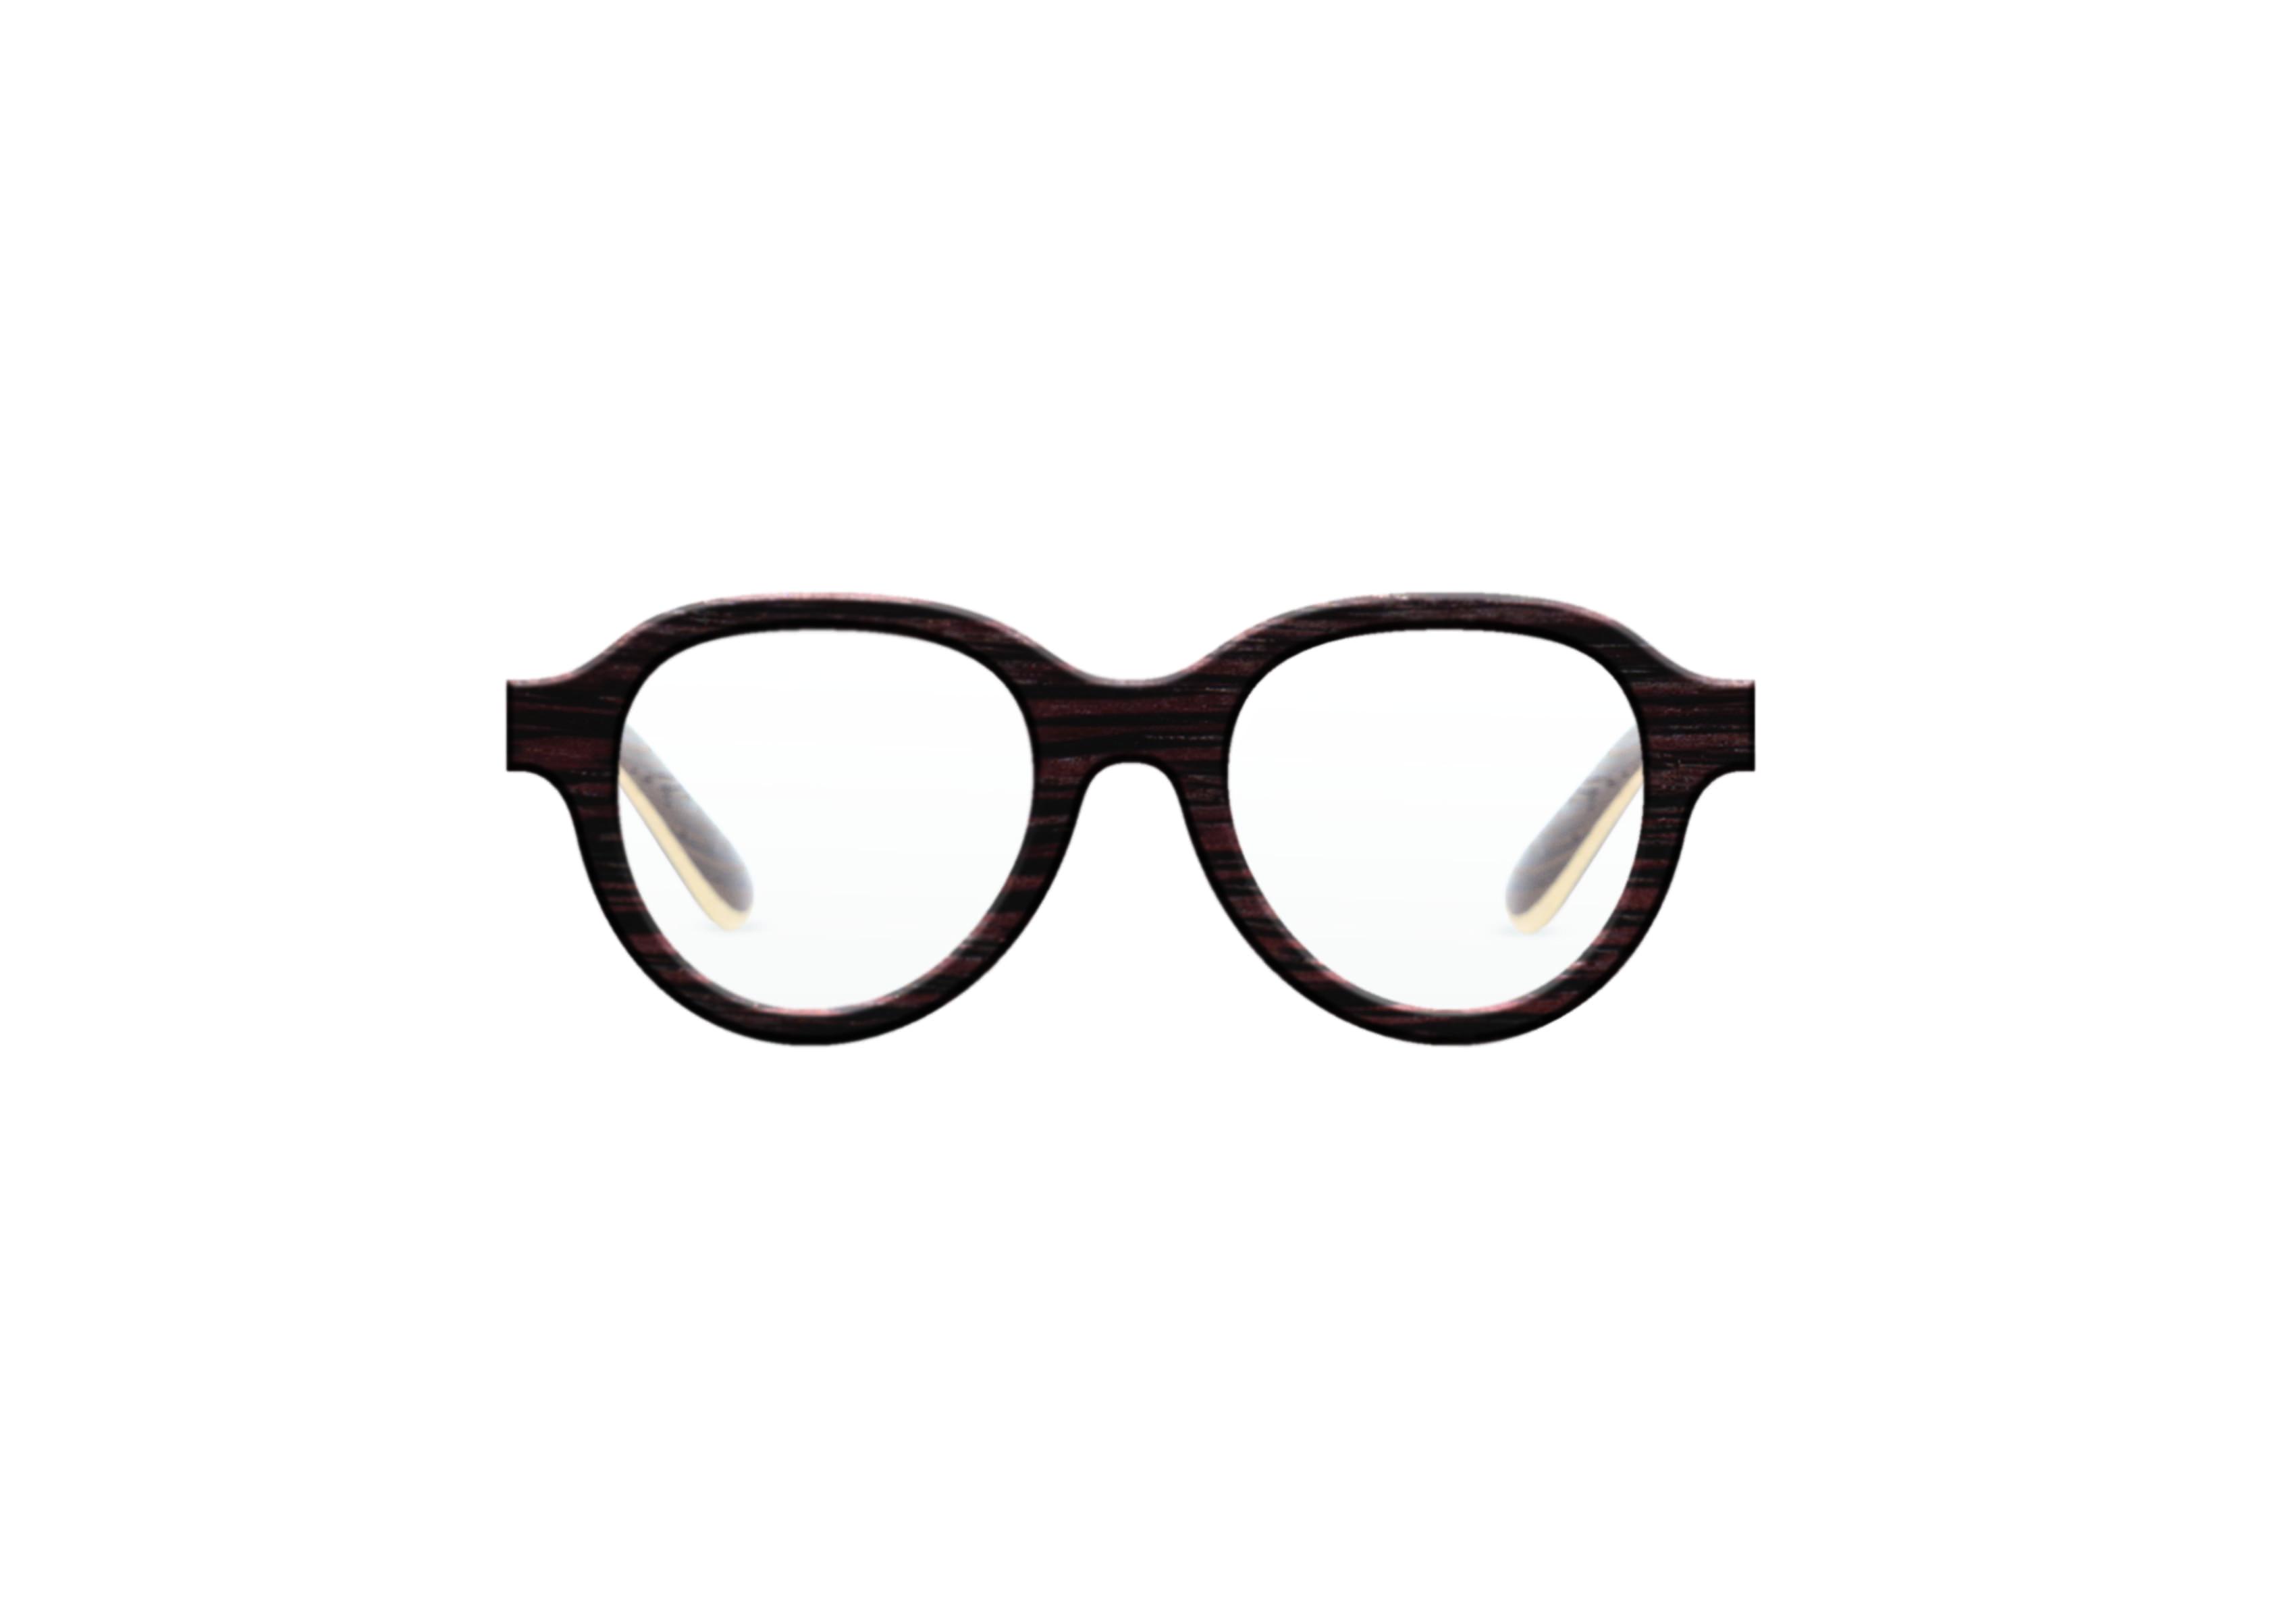 Carmin VAKAY handmade wooden eyewear